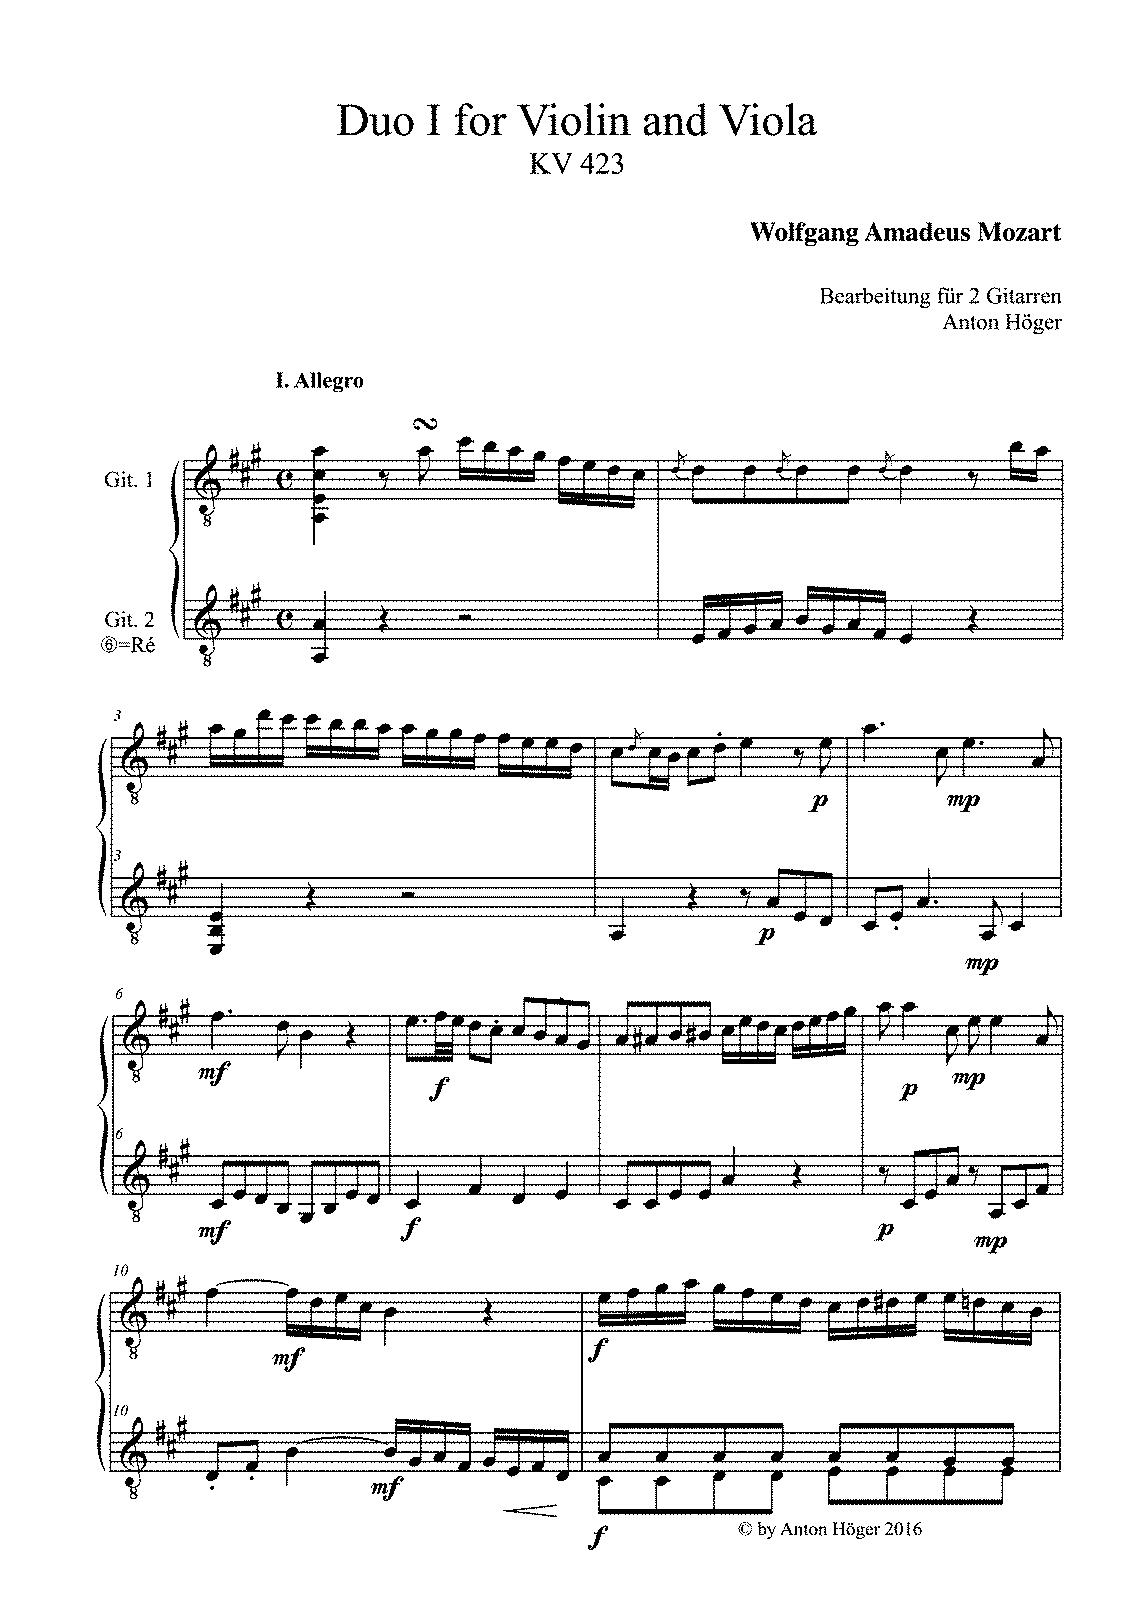 duo for violin and viola  k 423  mozart  wolfgang amadeus